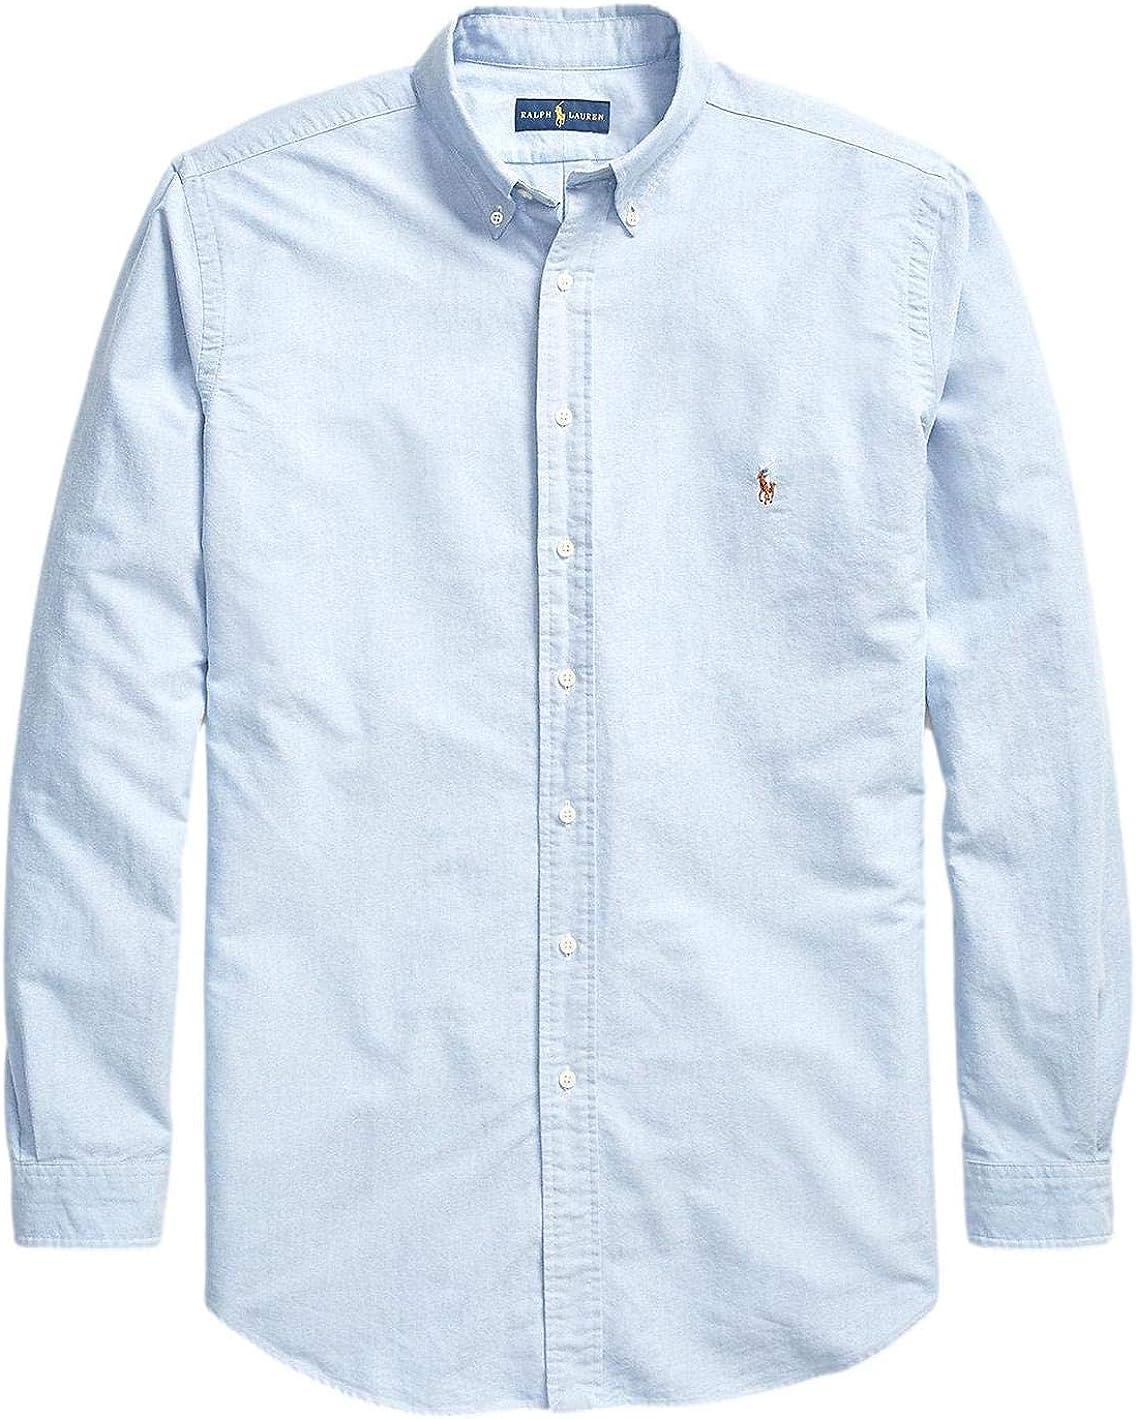 Polo Ralph Lauren Men's Big and Tall Long Sleeves Classic Fit Oxford Buttondown Shirt (3XLT, BSR Blue)